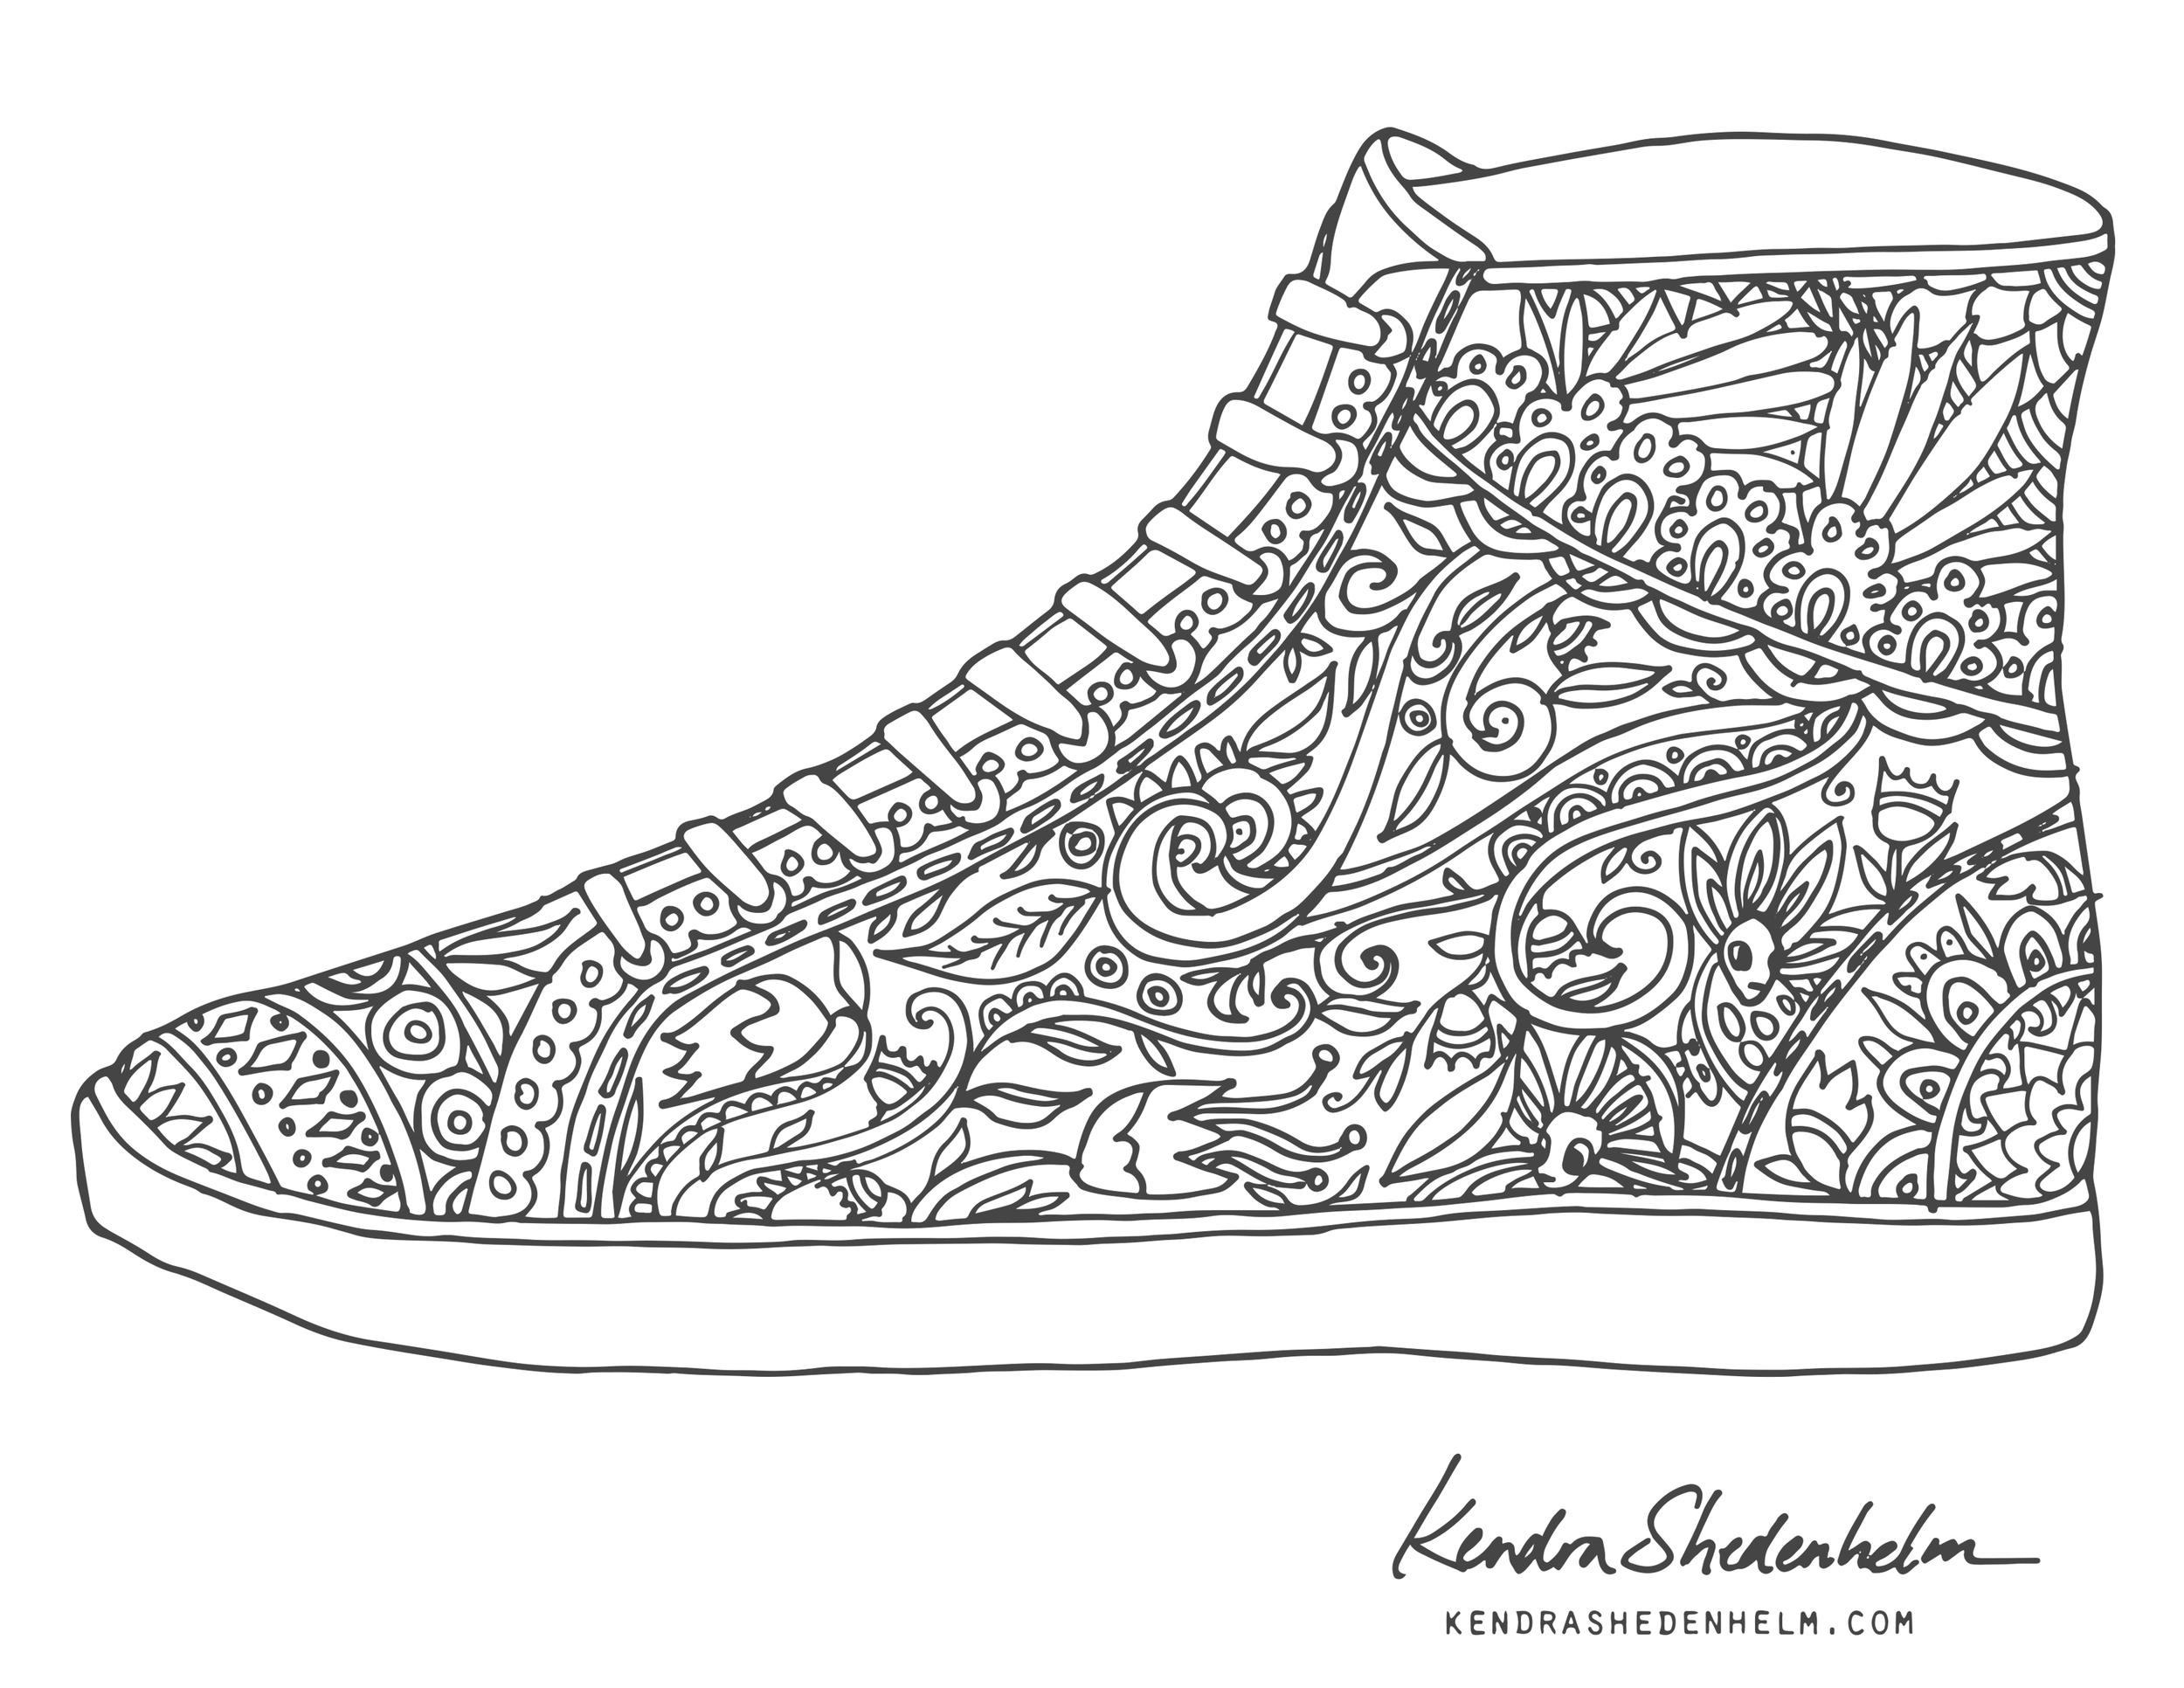 Kendra_Shedenhelm_Coloring-Pages_Shoe_1.jpg